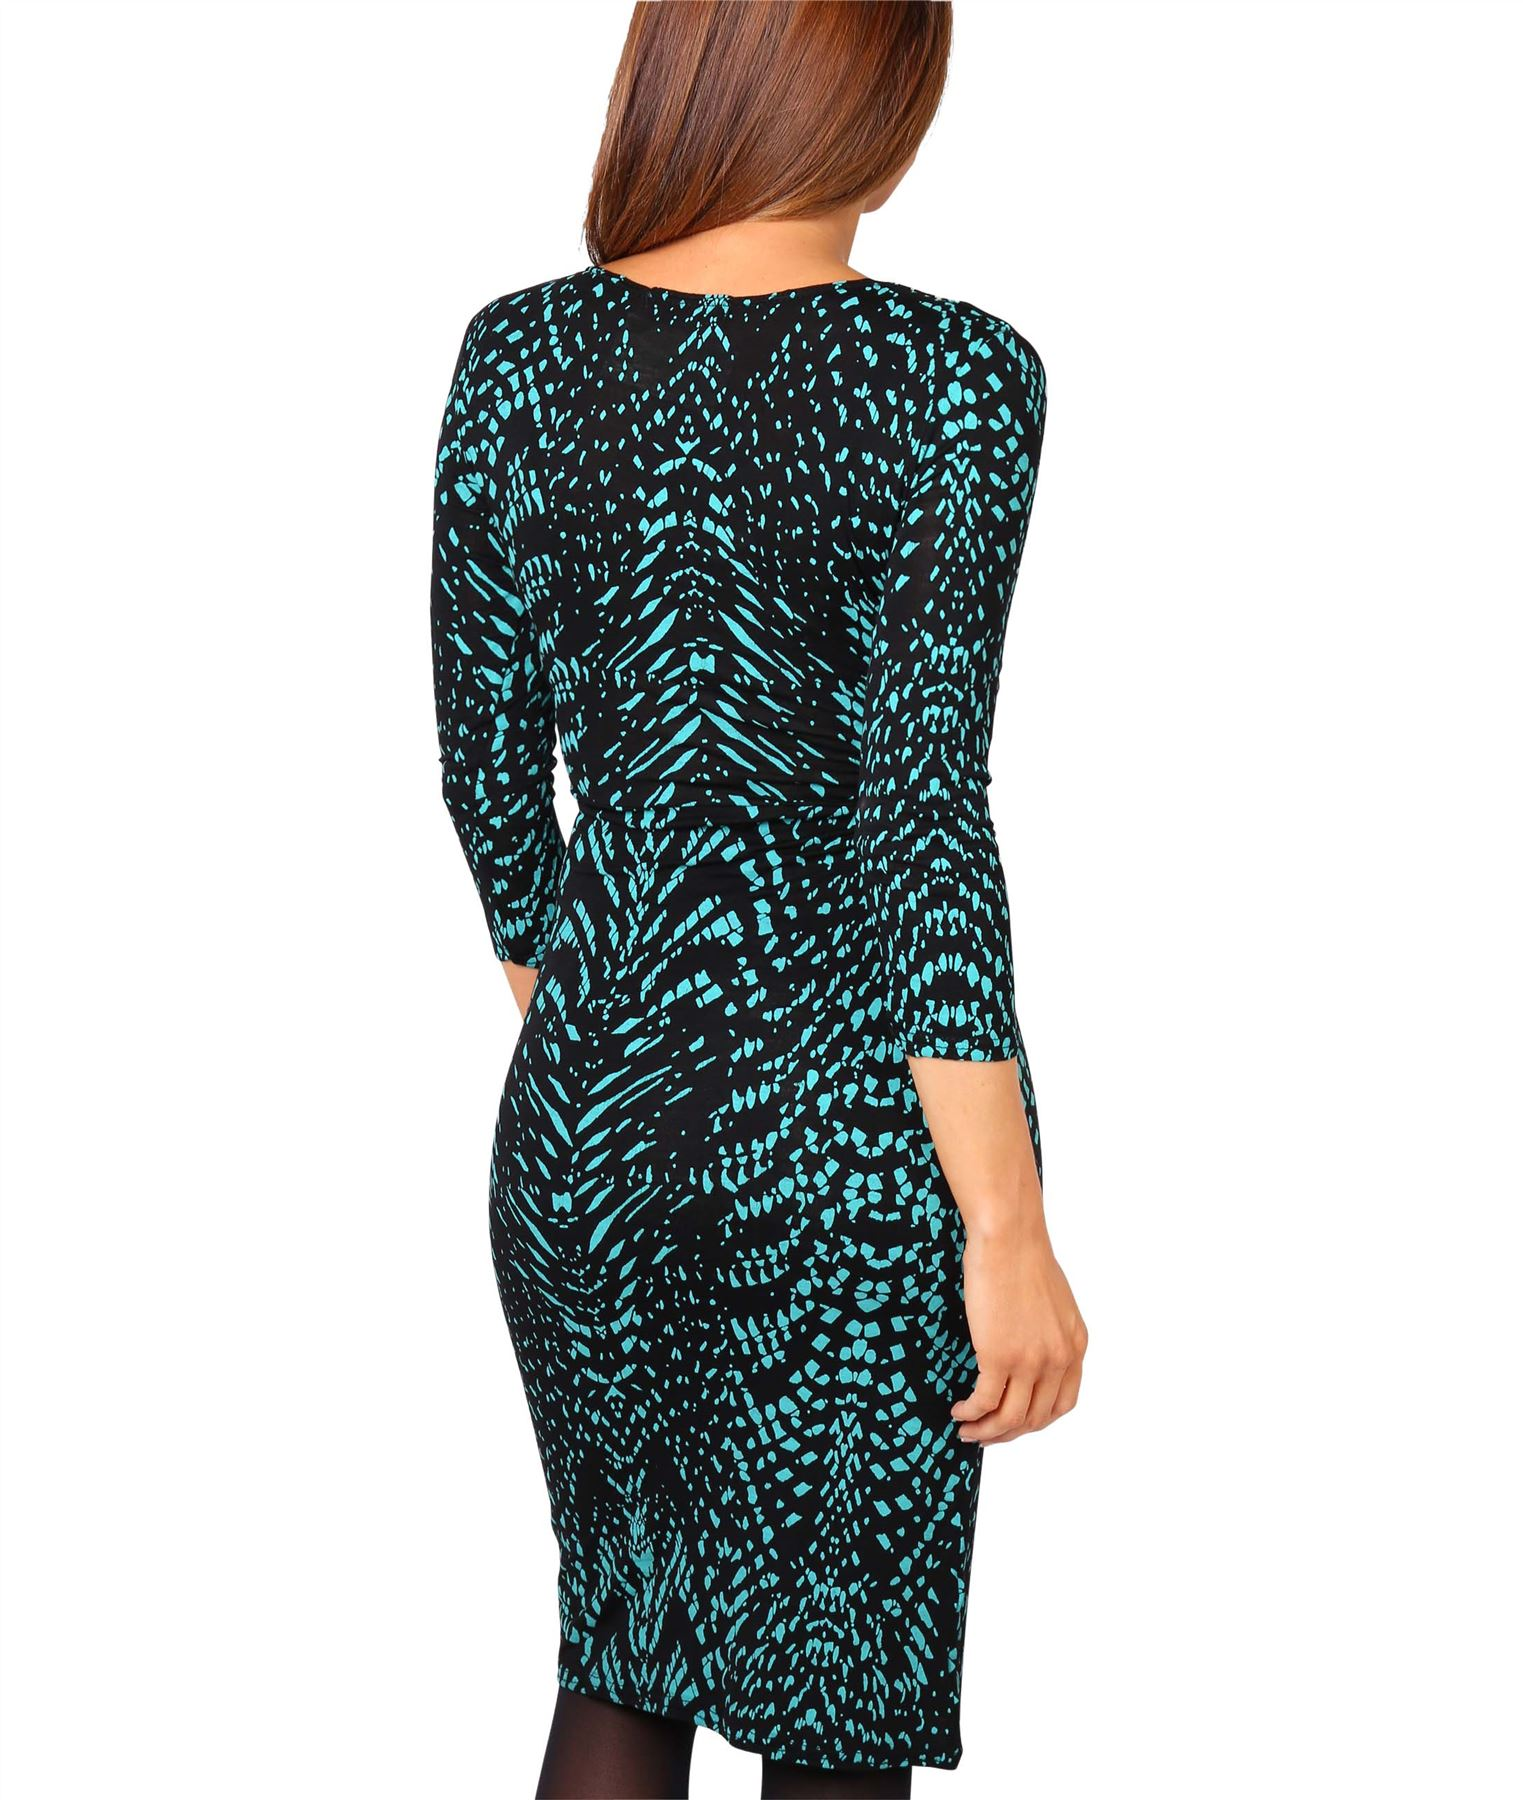 Womens-V-Neck-Dress-Top-Bodycon-Skirt-Midi-Snakeskin-Print-Cross-Over-Party-Wrap thumbnail 19